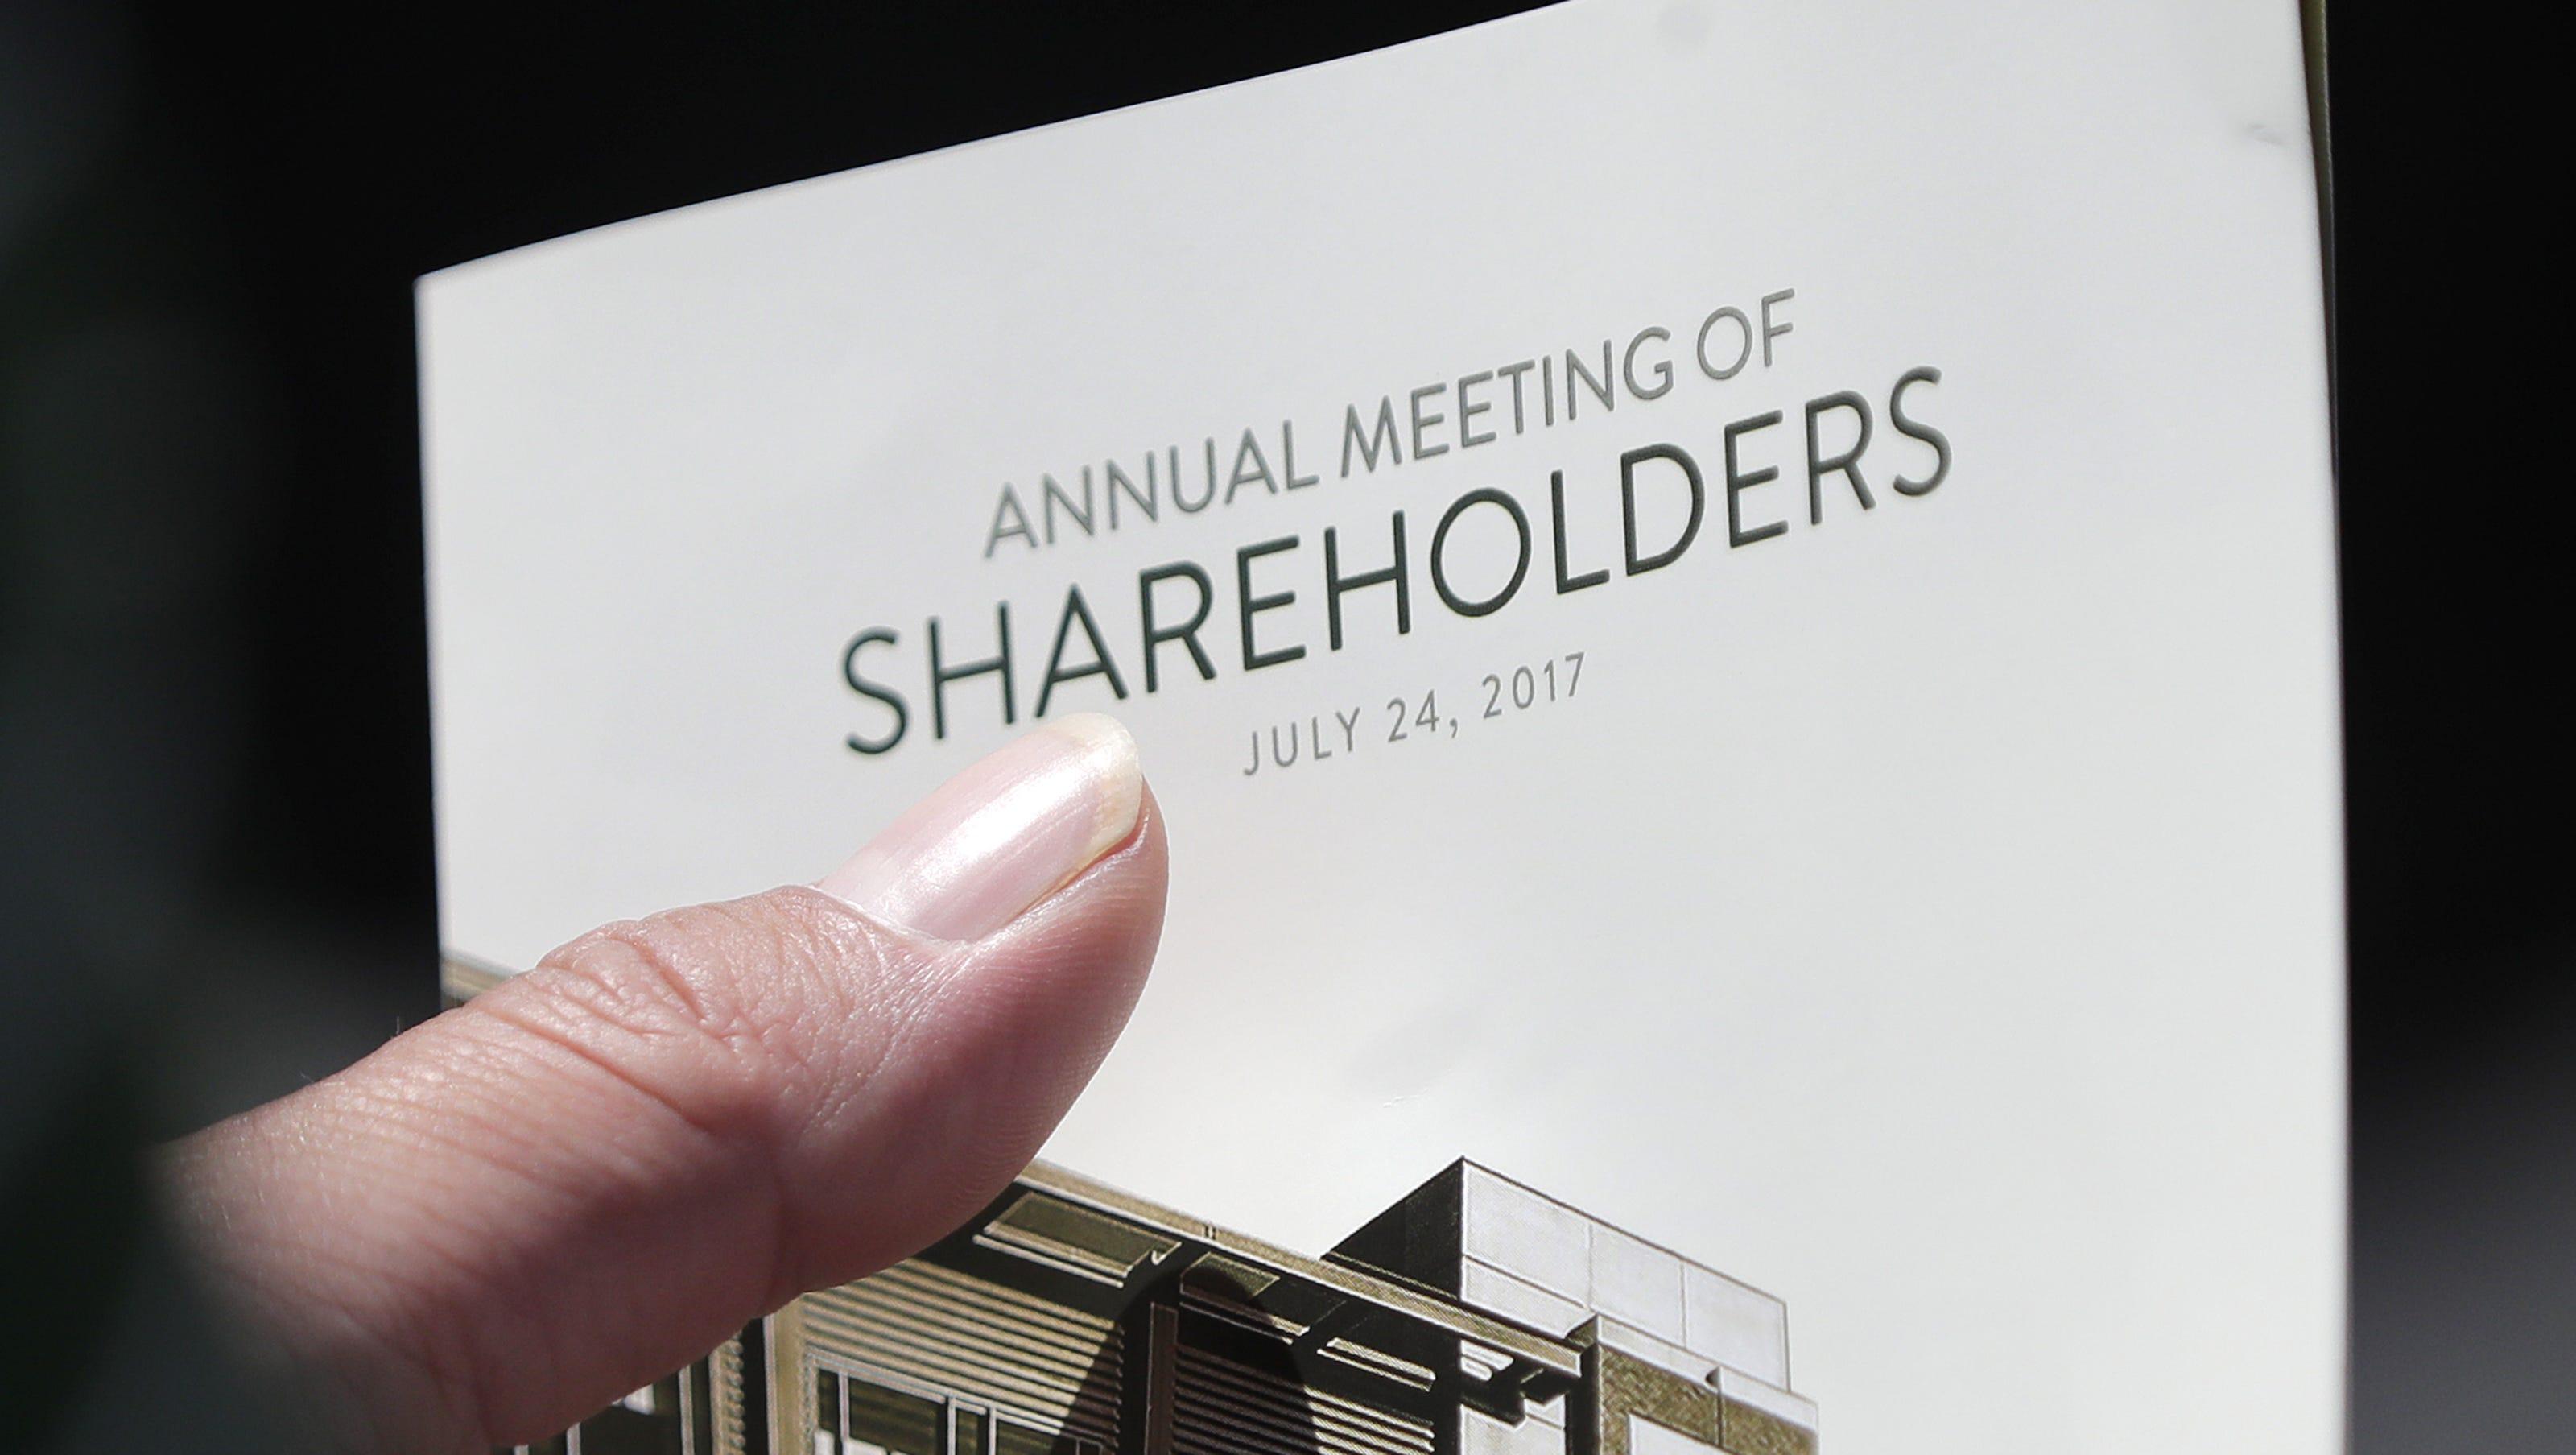 636365107213987615-gpg-shareholdermeeting-072417-abw181